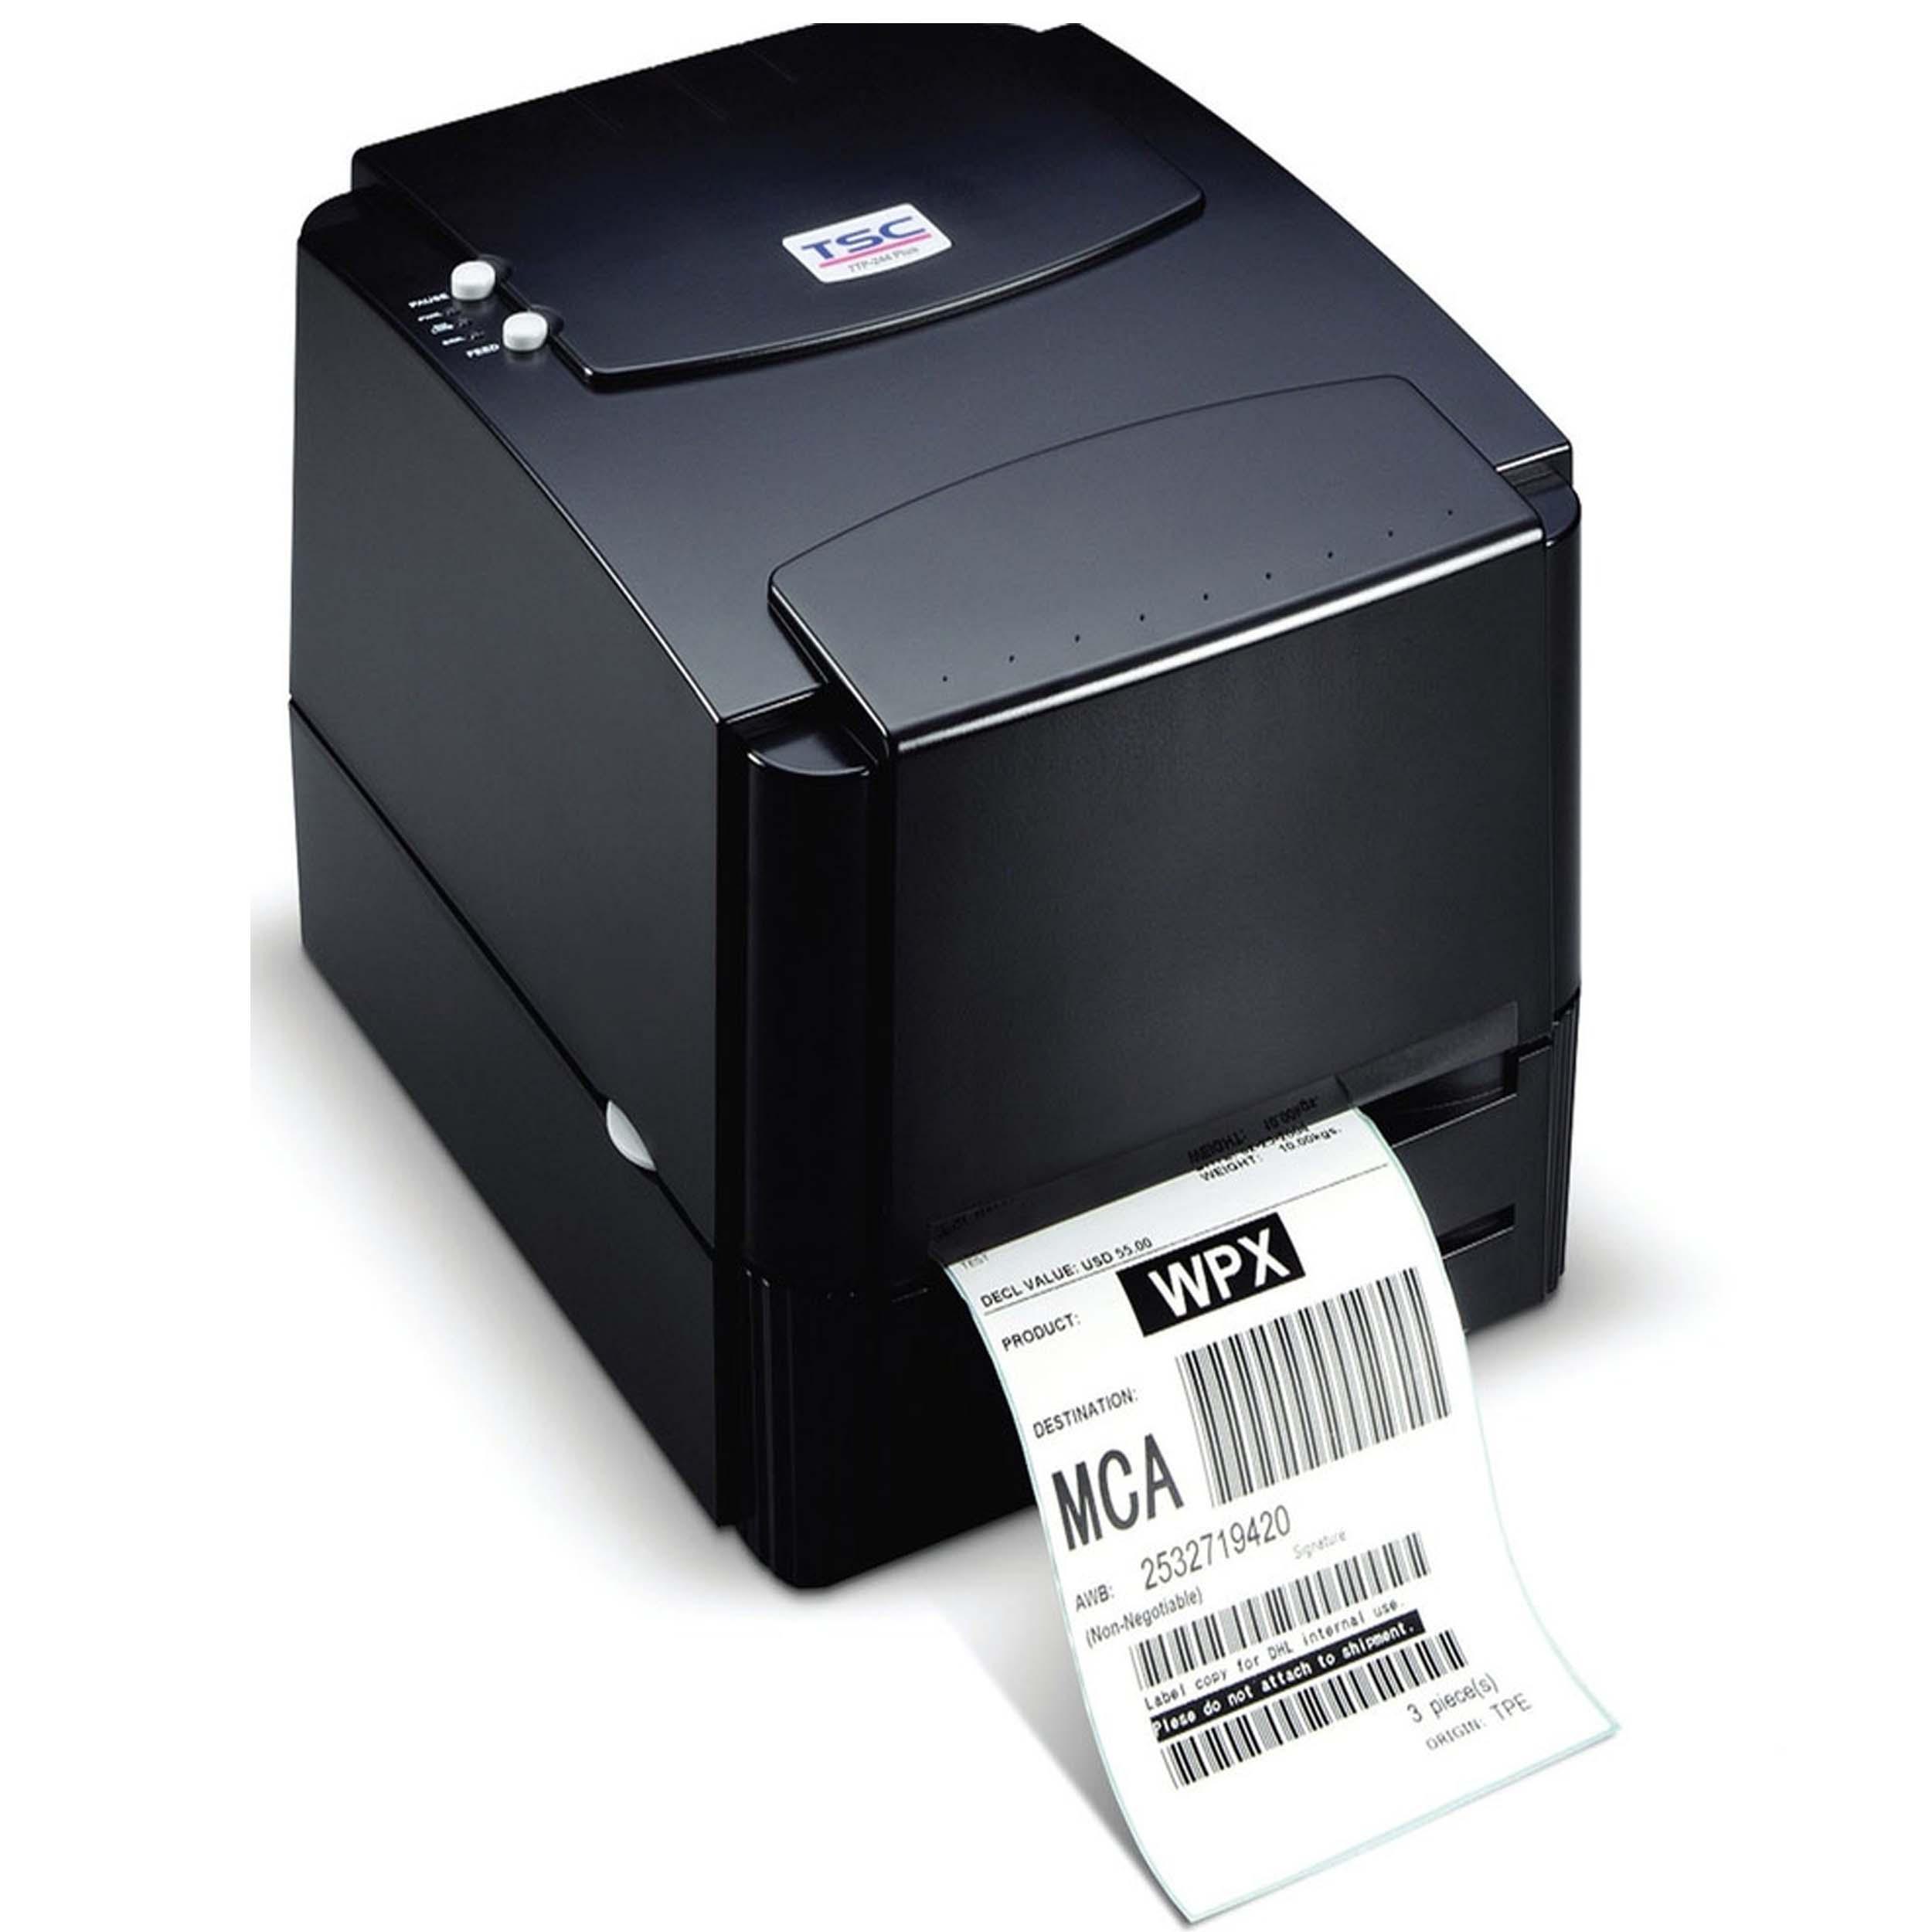 1c6200aca790 barcode label printer